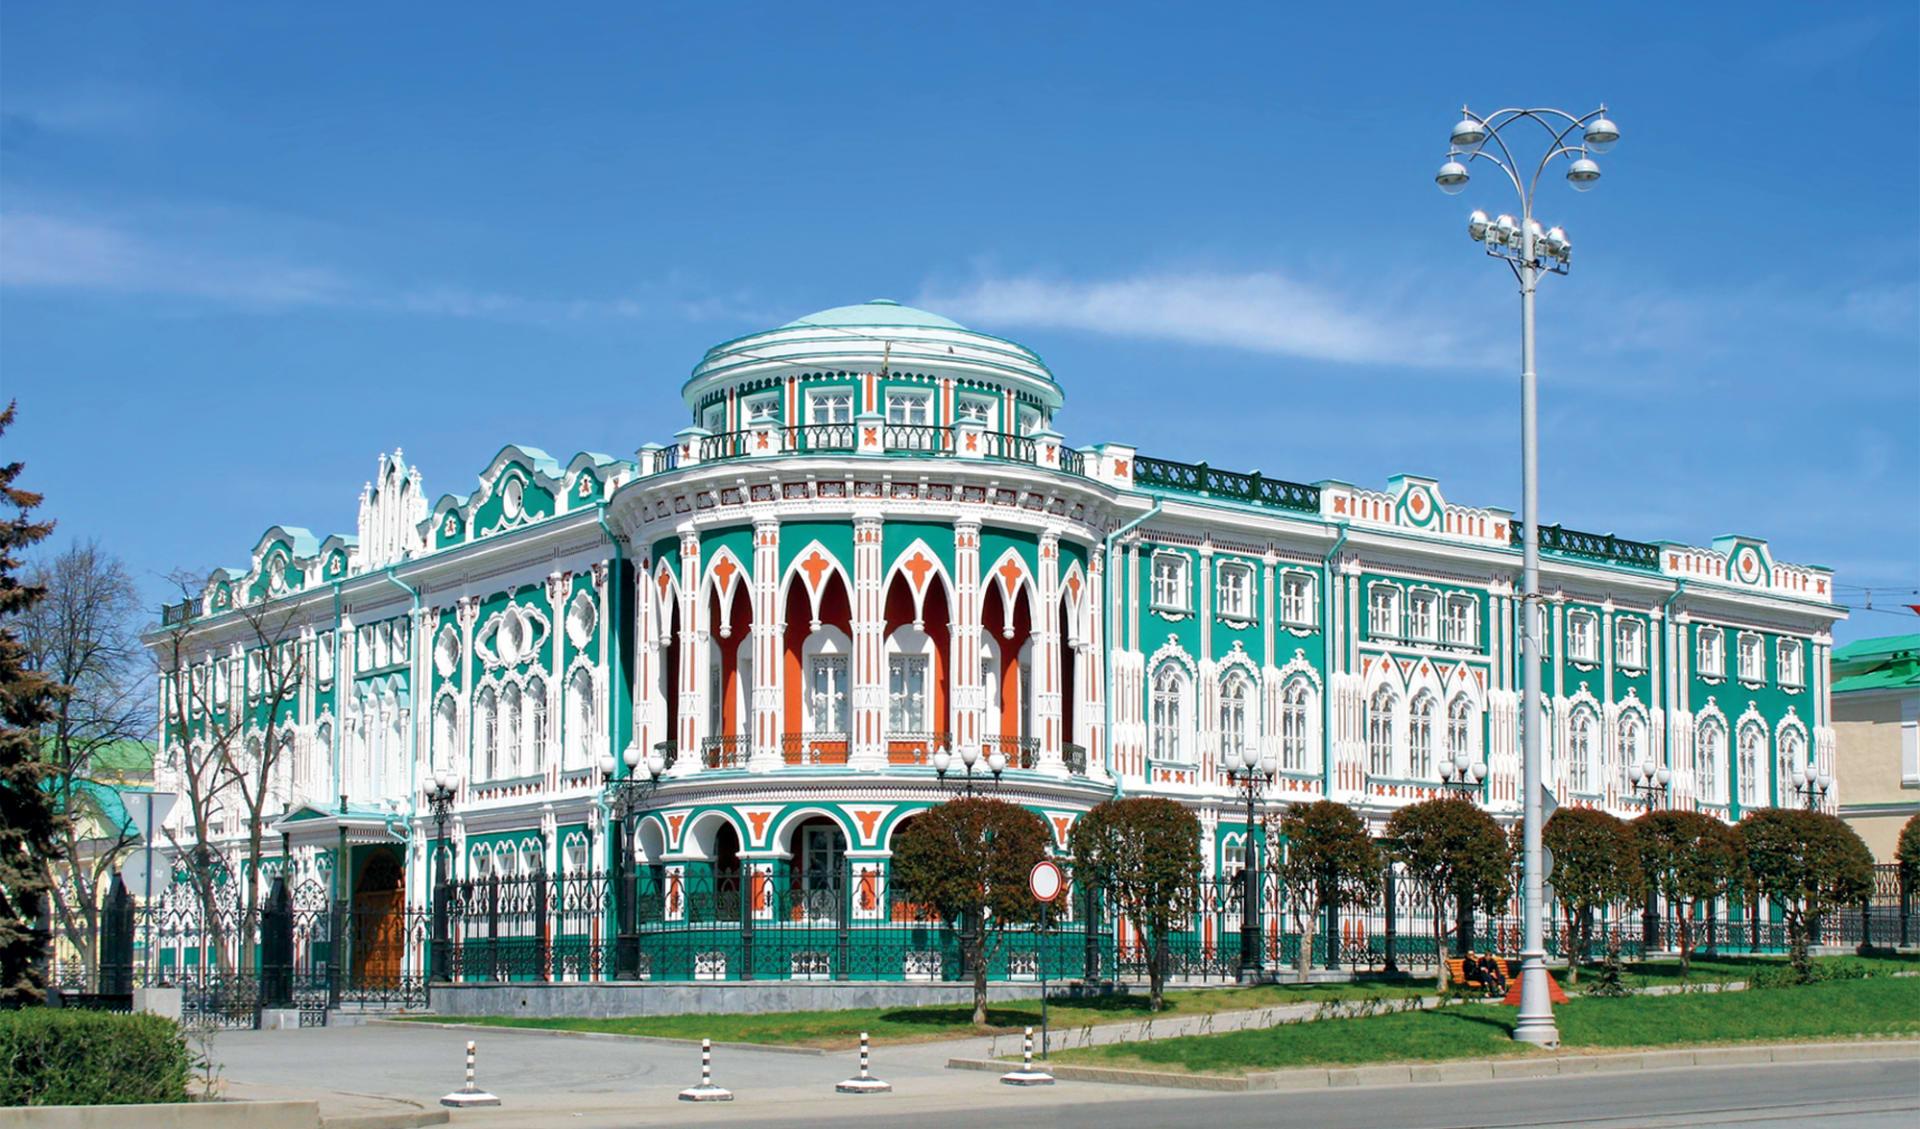 Sonderzug Zarengold Moskau - Peking: Jekaterinburg li Sevastyanovs Haus